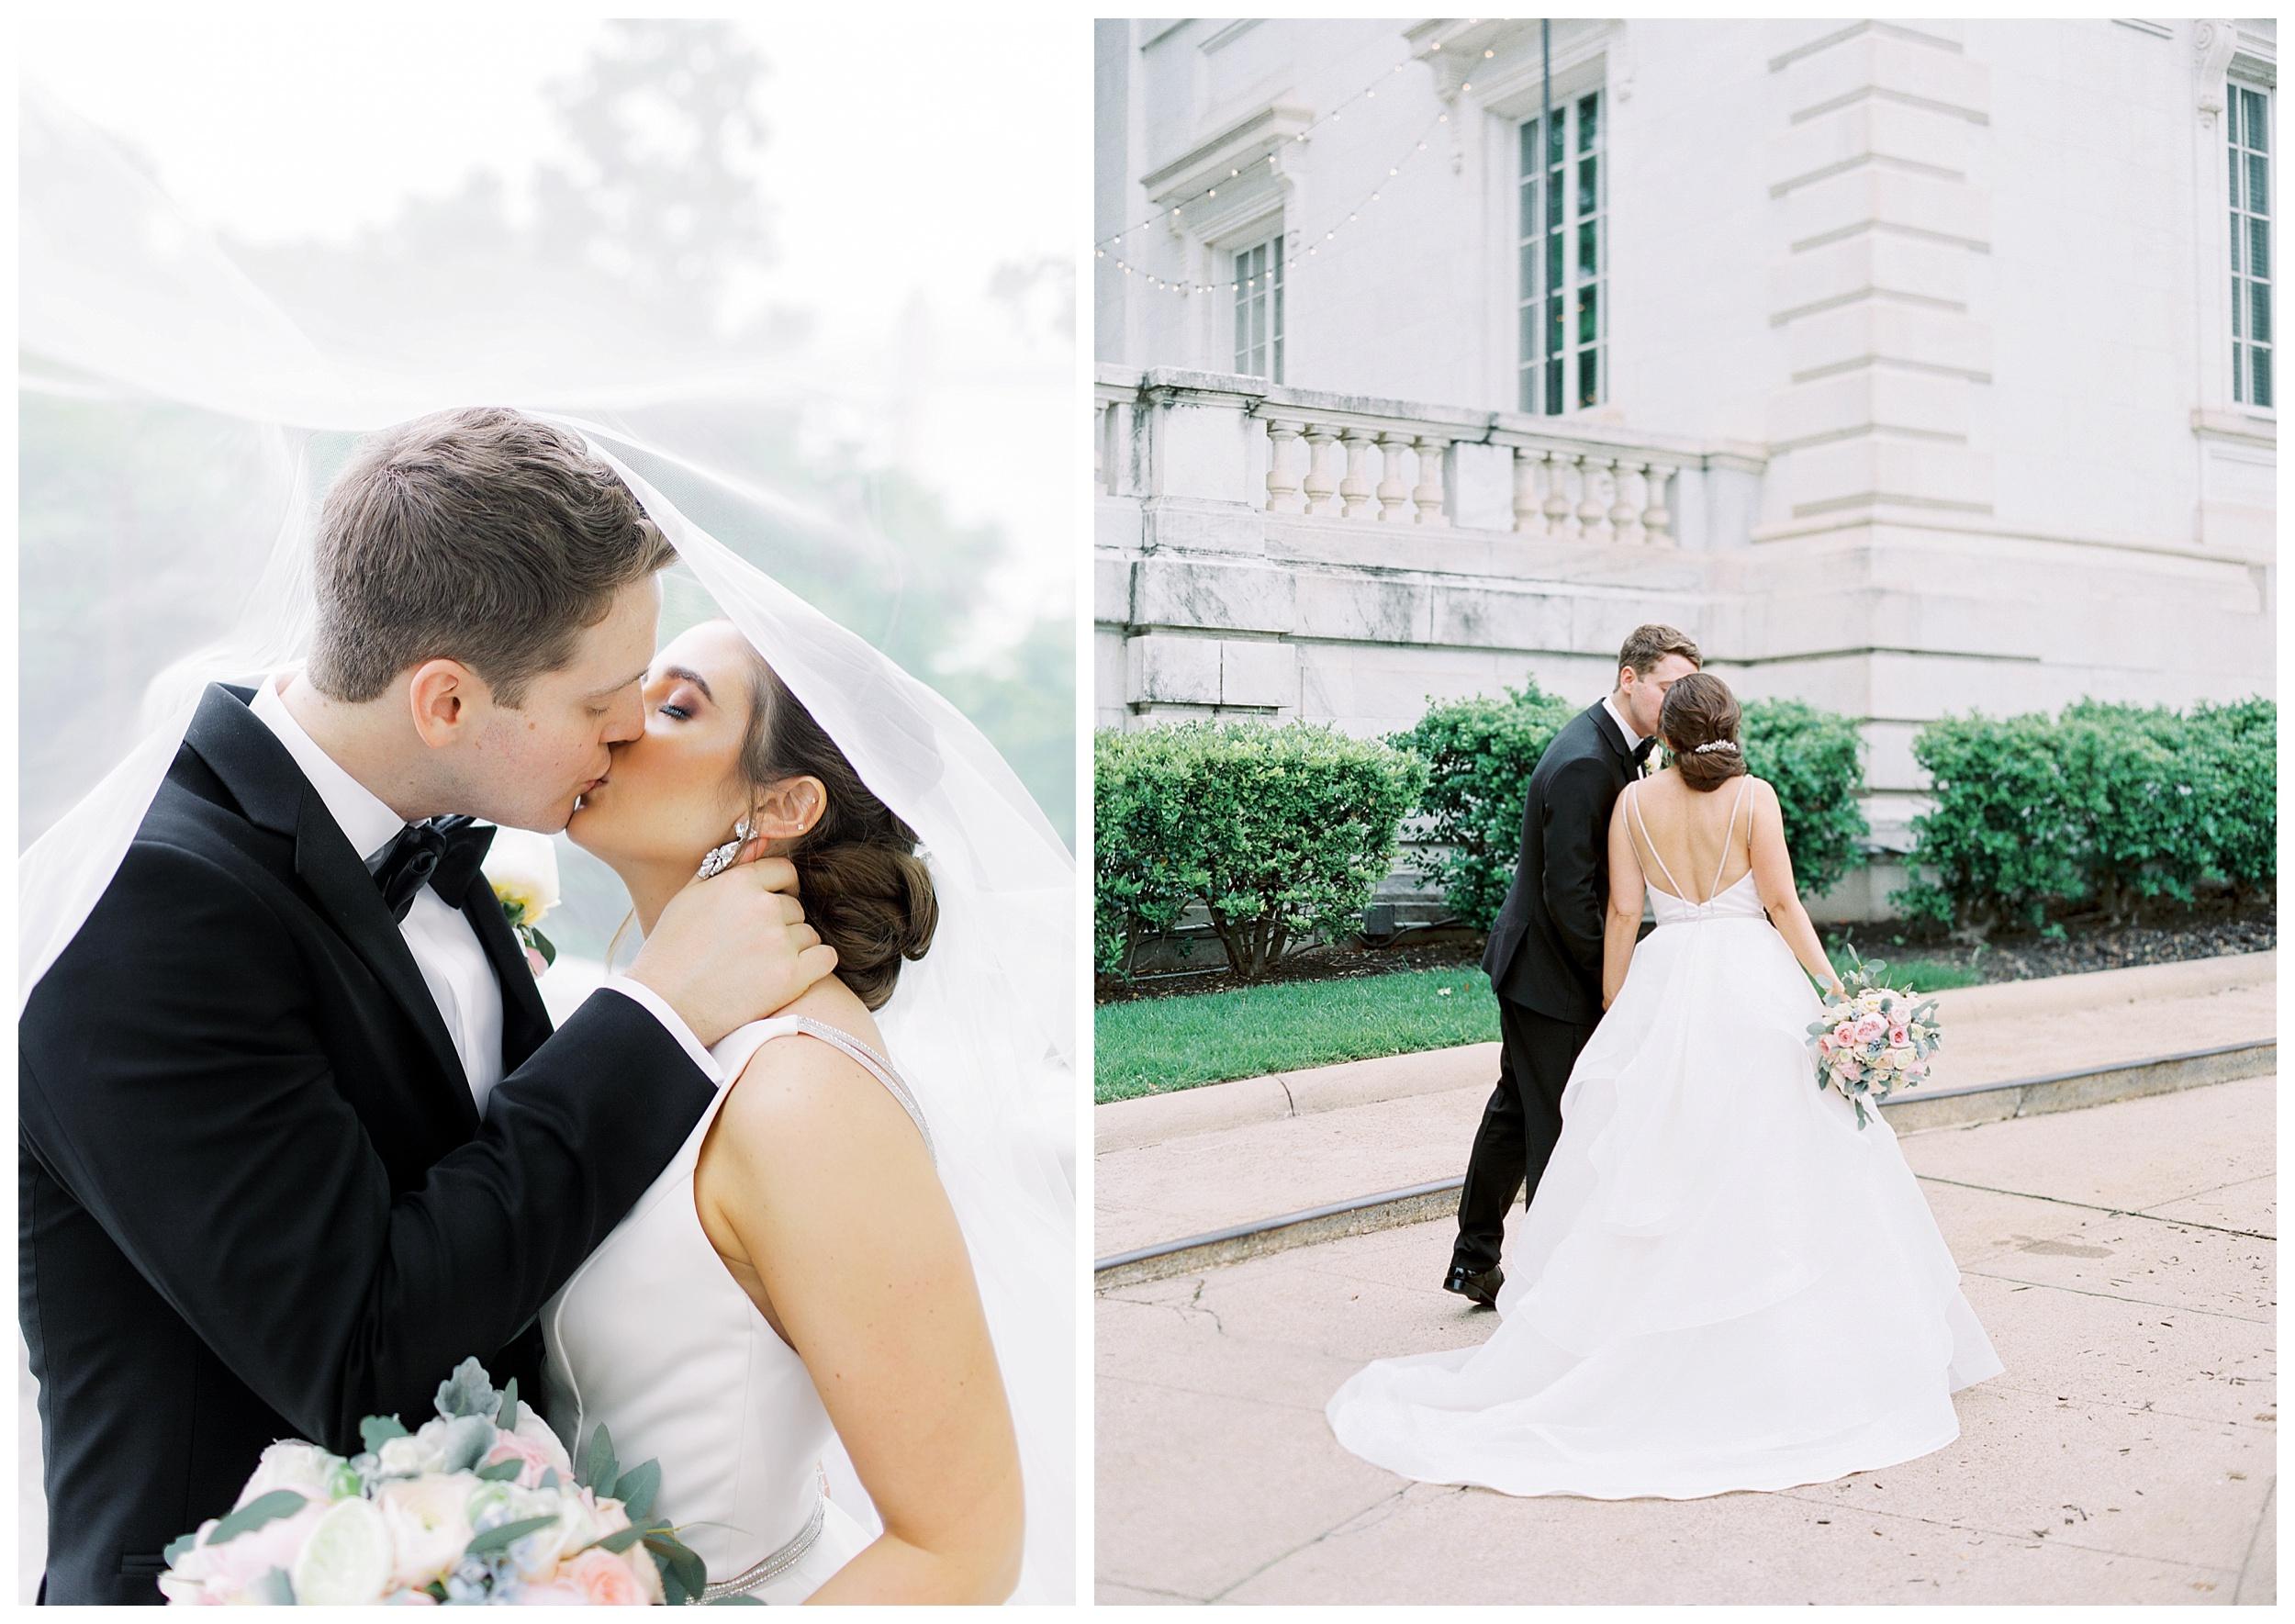 DAR Constitution Hall Wedding Wedding | Daughters of the American Revolution Wedding | District of Columbia Film Wedding Photographer Kir Tuben_0101.jpg